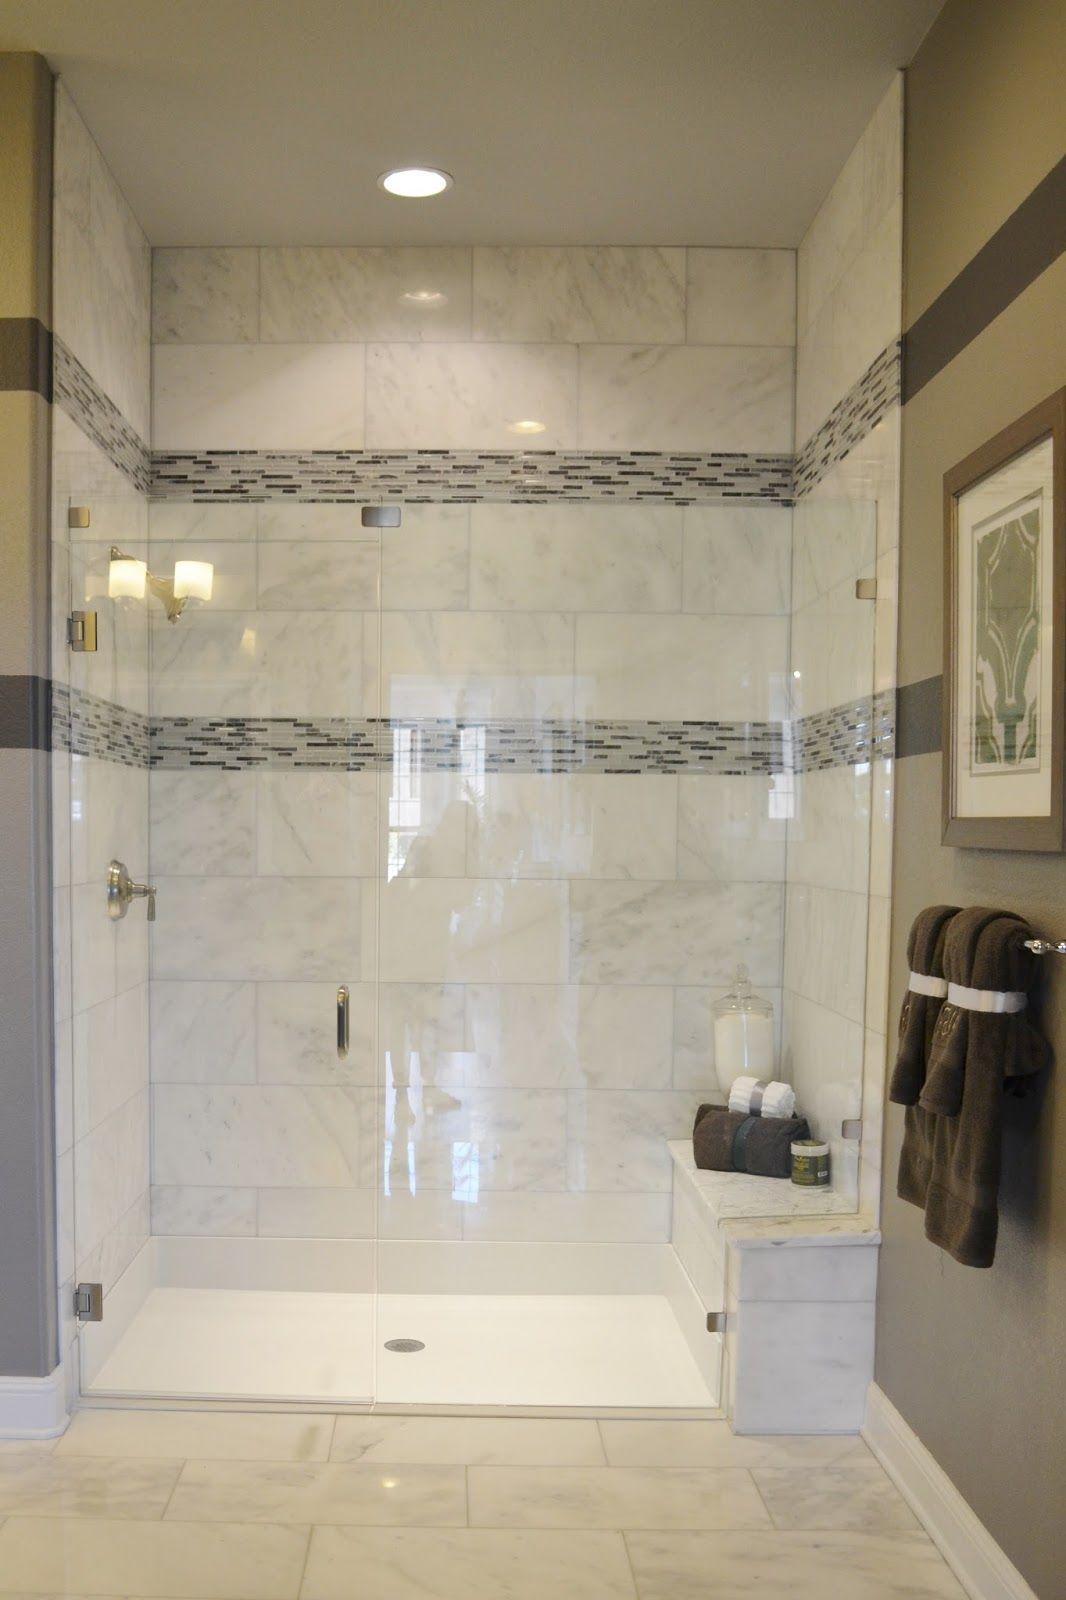 Terrific Bathroom Stone Tile Layout - Bathroom Design Ideas Gallery ...